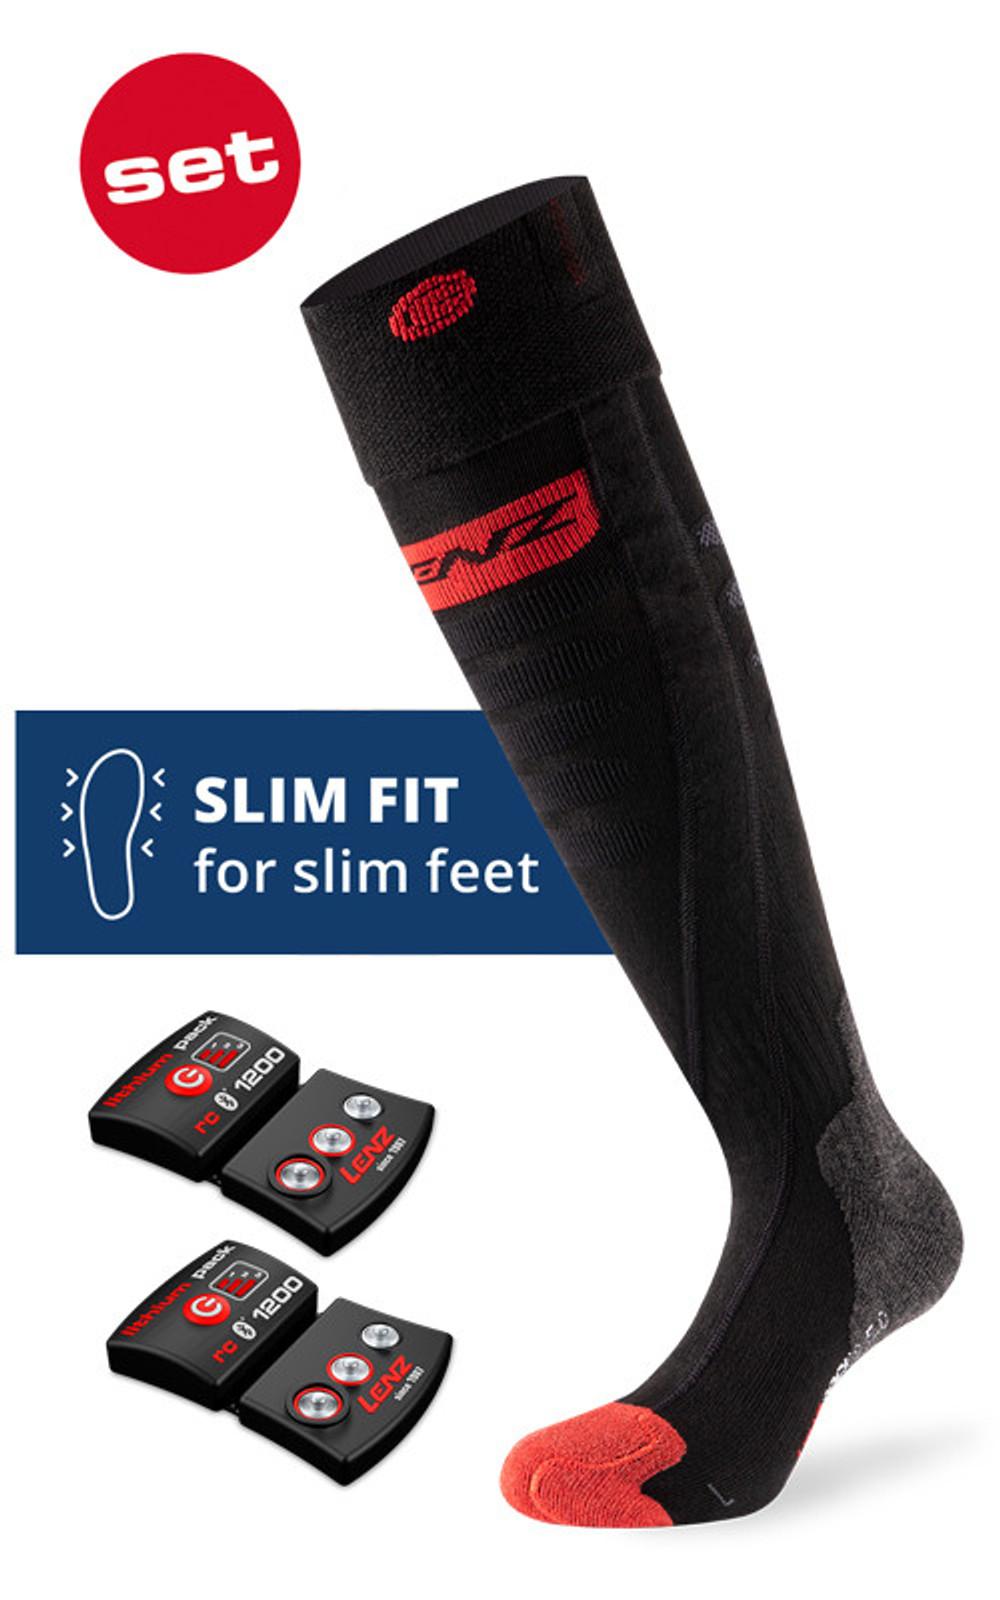 Lenz HEAT SOCK 5.0 TOE CAP SLIM FIT +RCB 1200